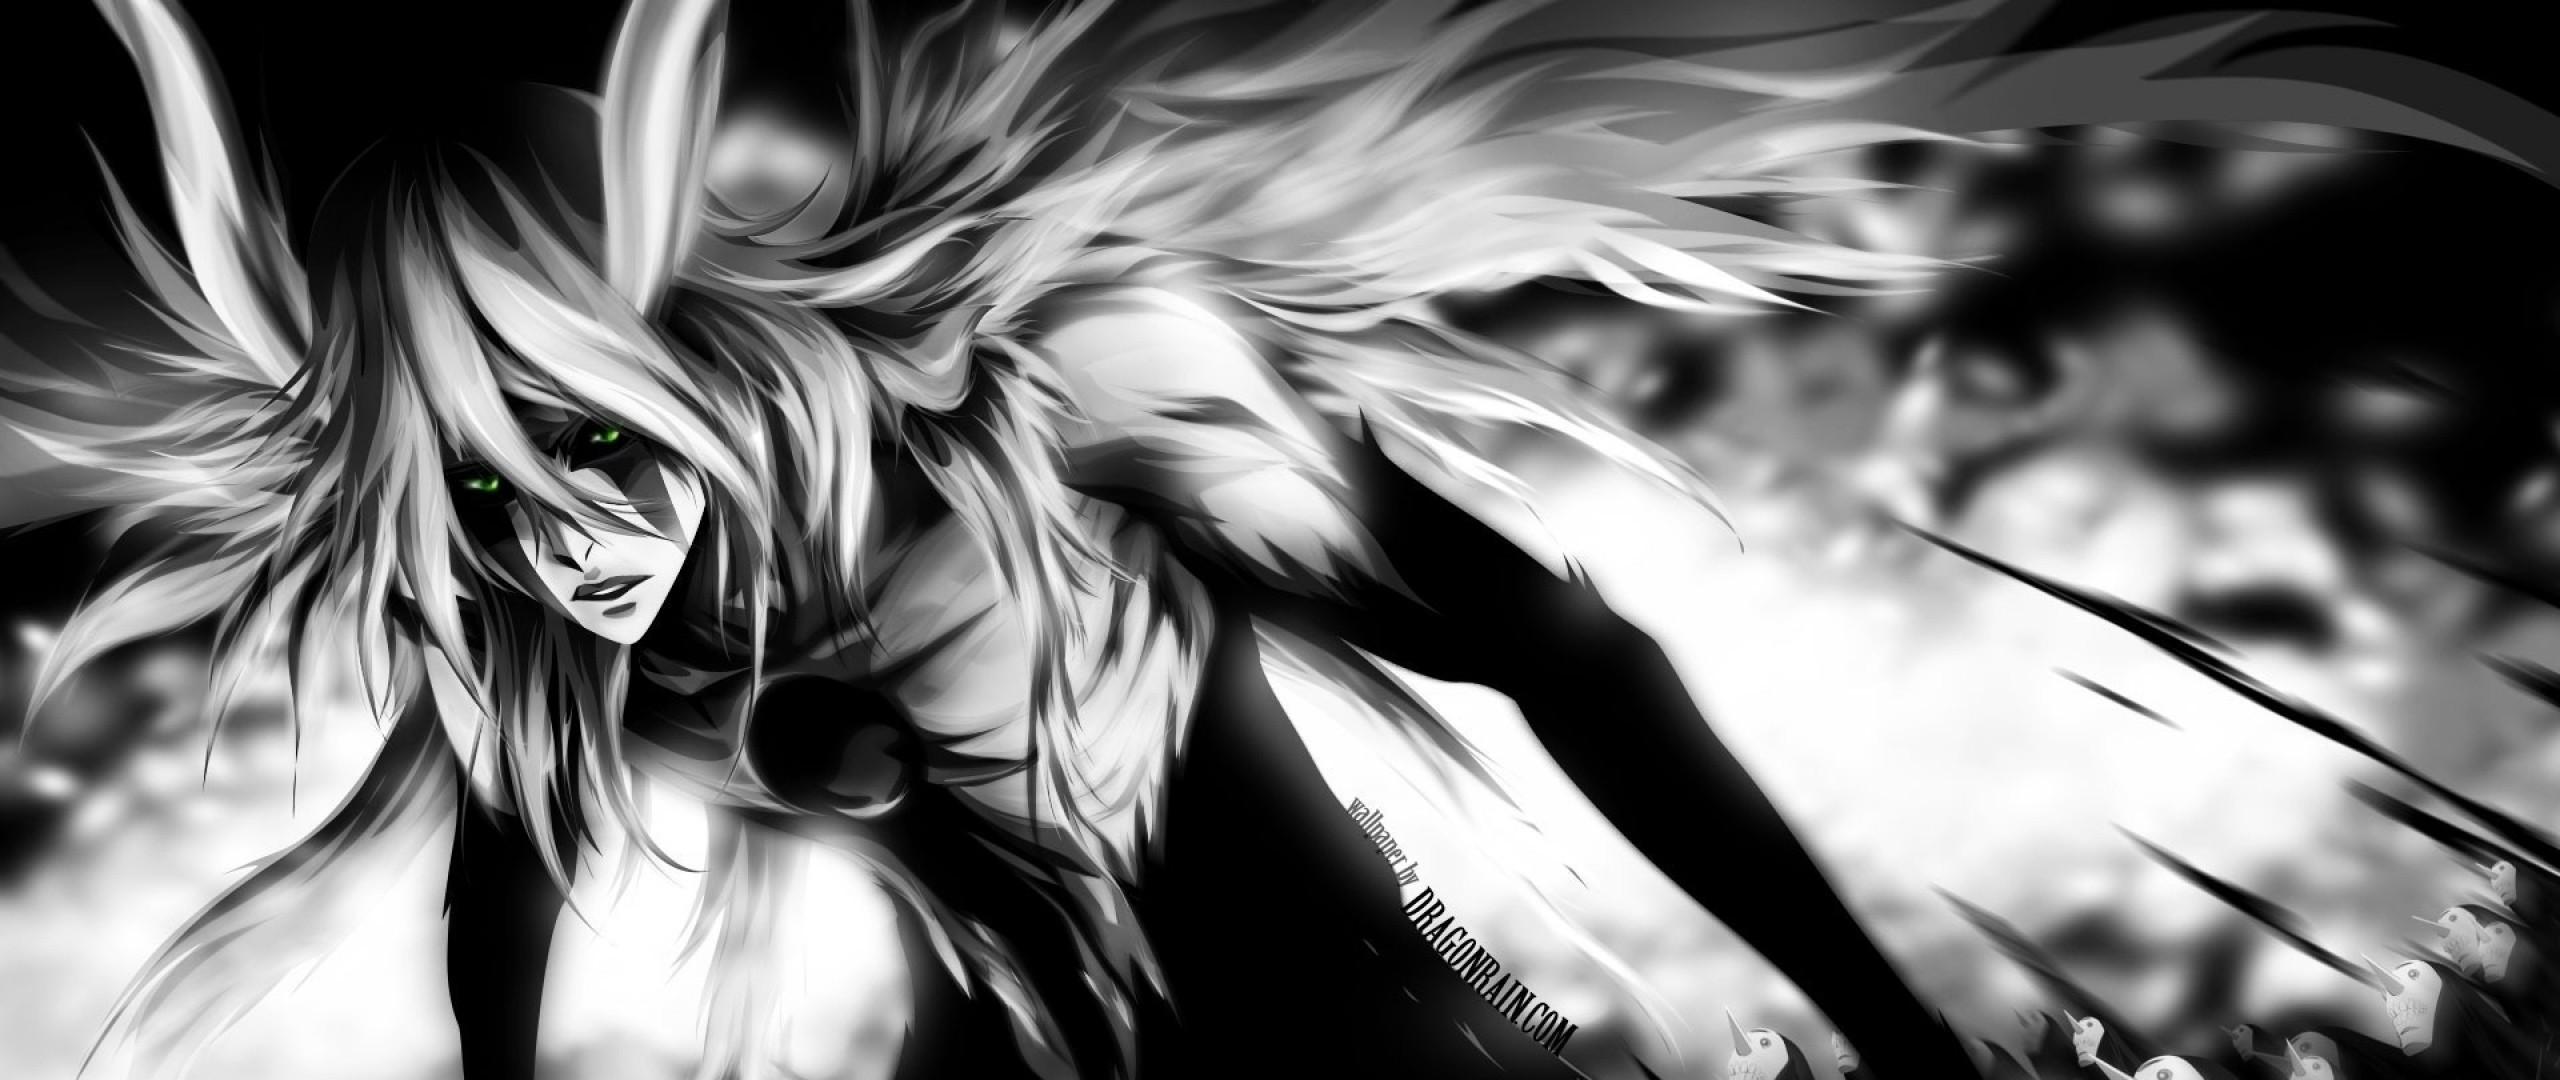 Wallpaper anime, ulquiorra, gillian, black and white, background